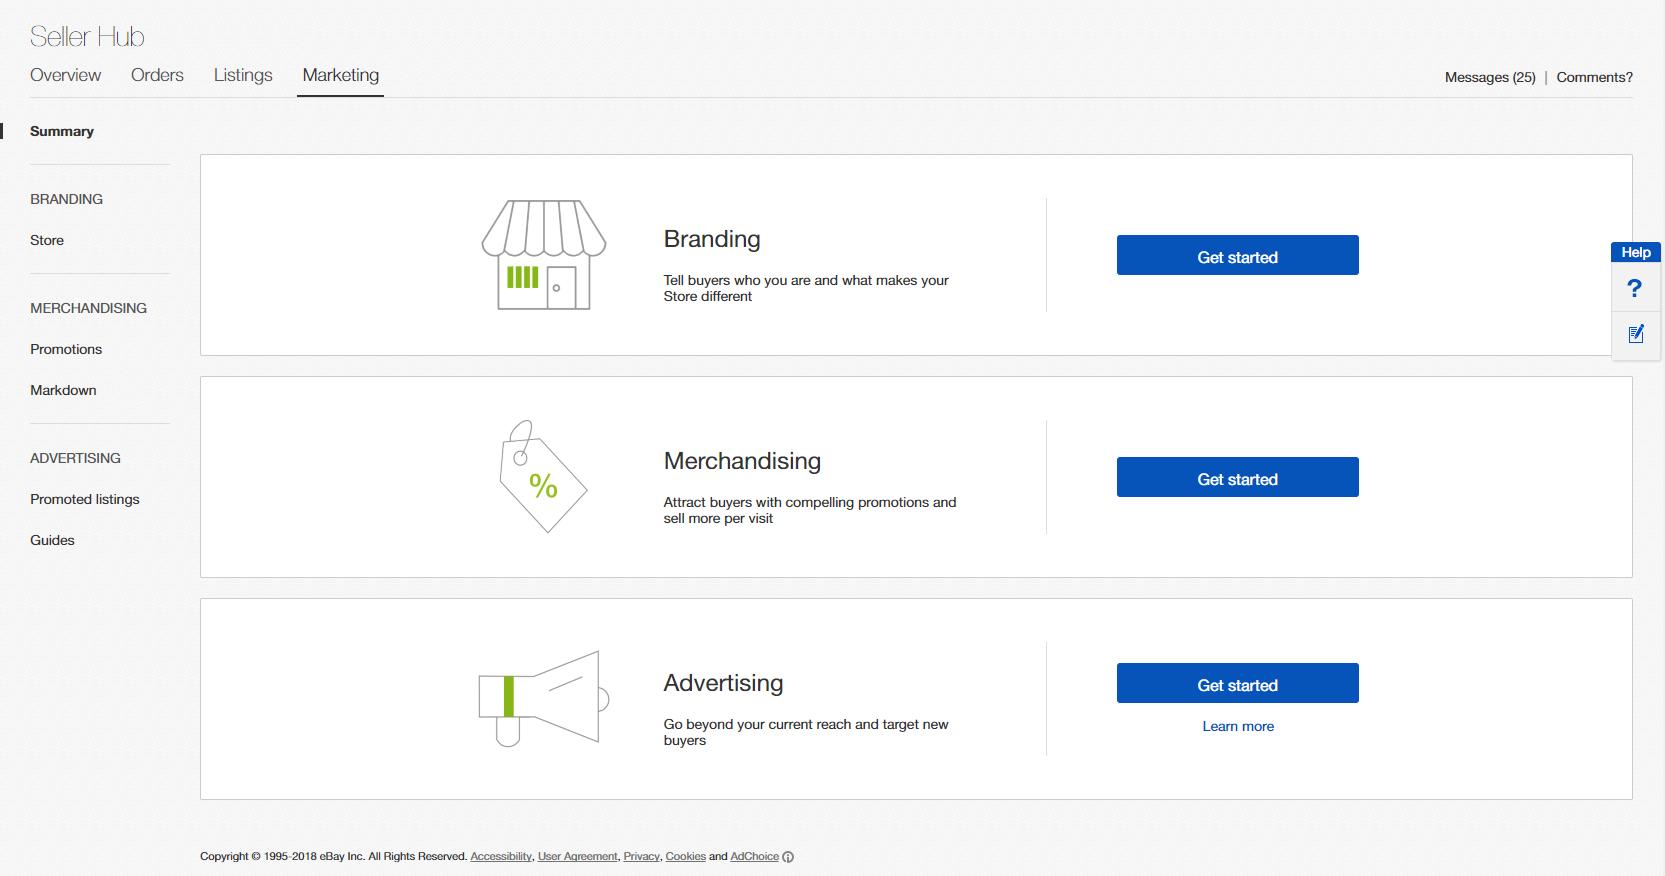 Seller Hub Marketing tab